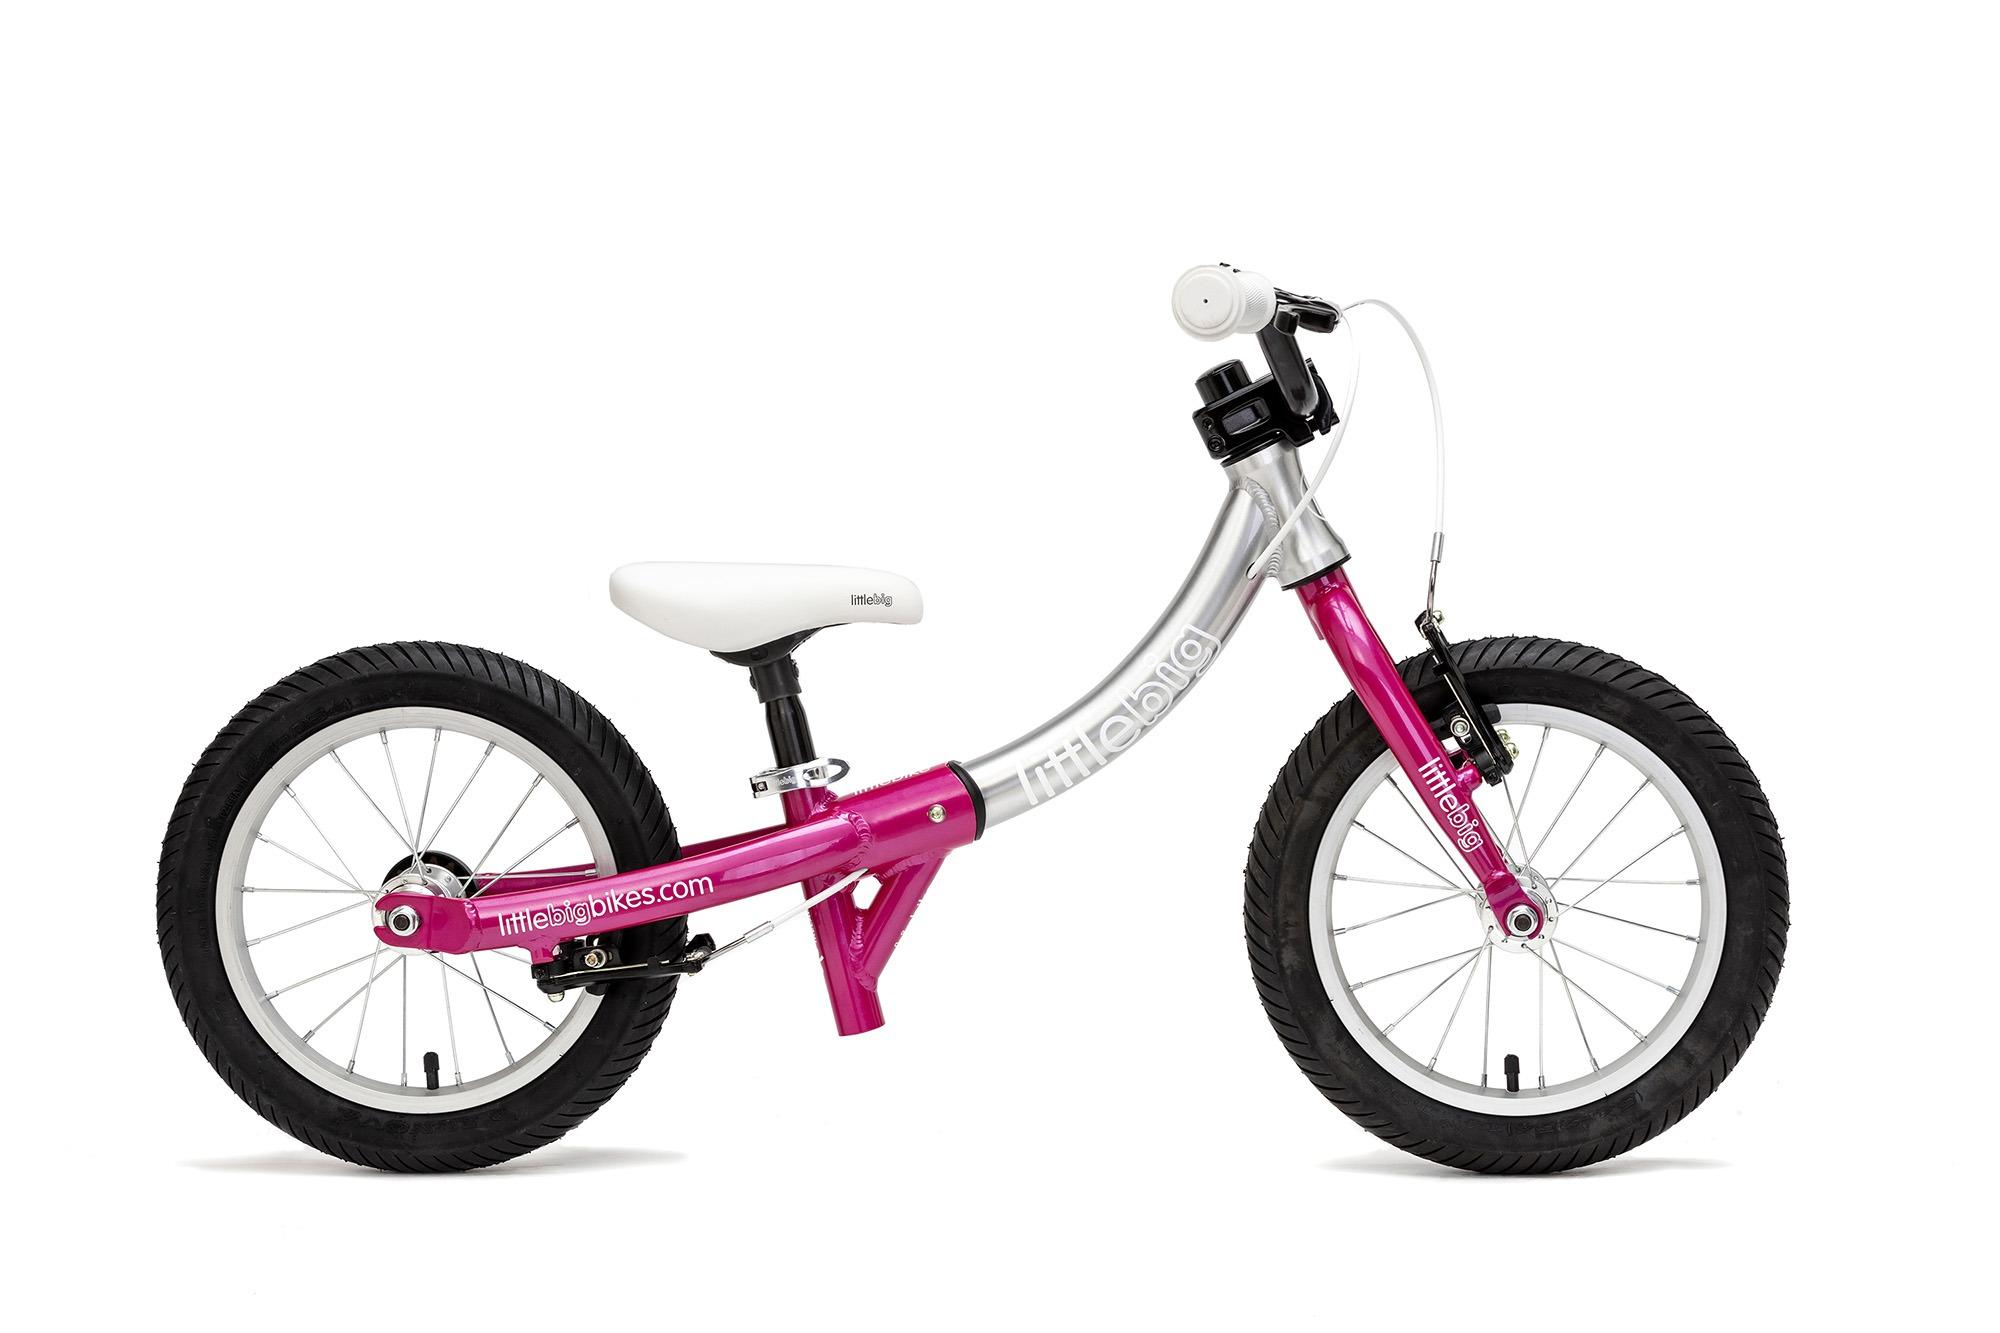 LittleBig little balance bike pink side